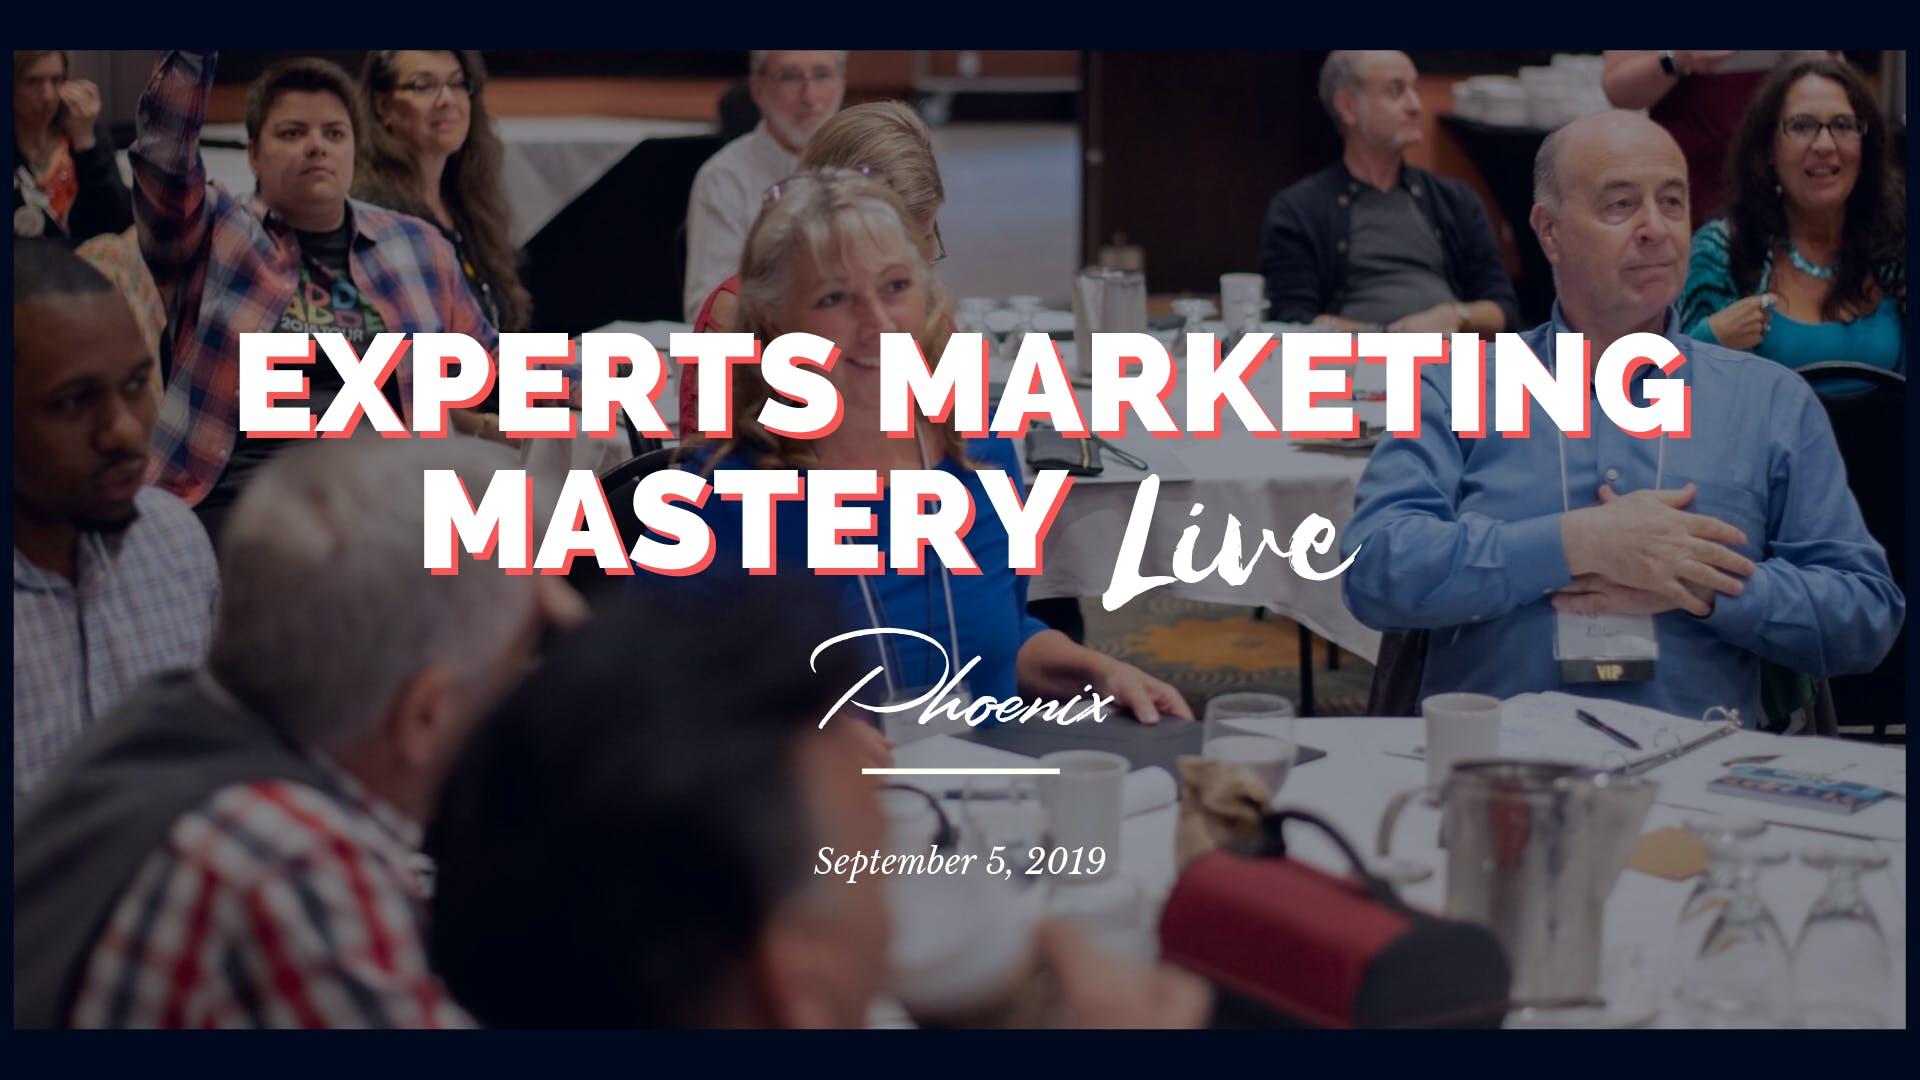 Experts Marketing Mastery Live